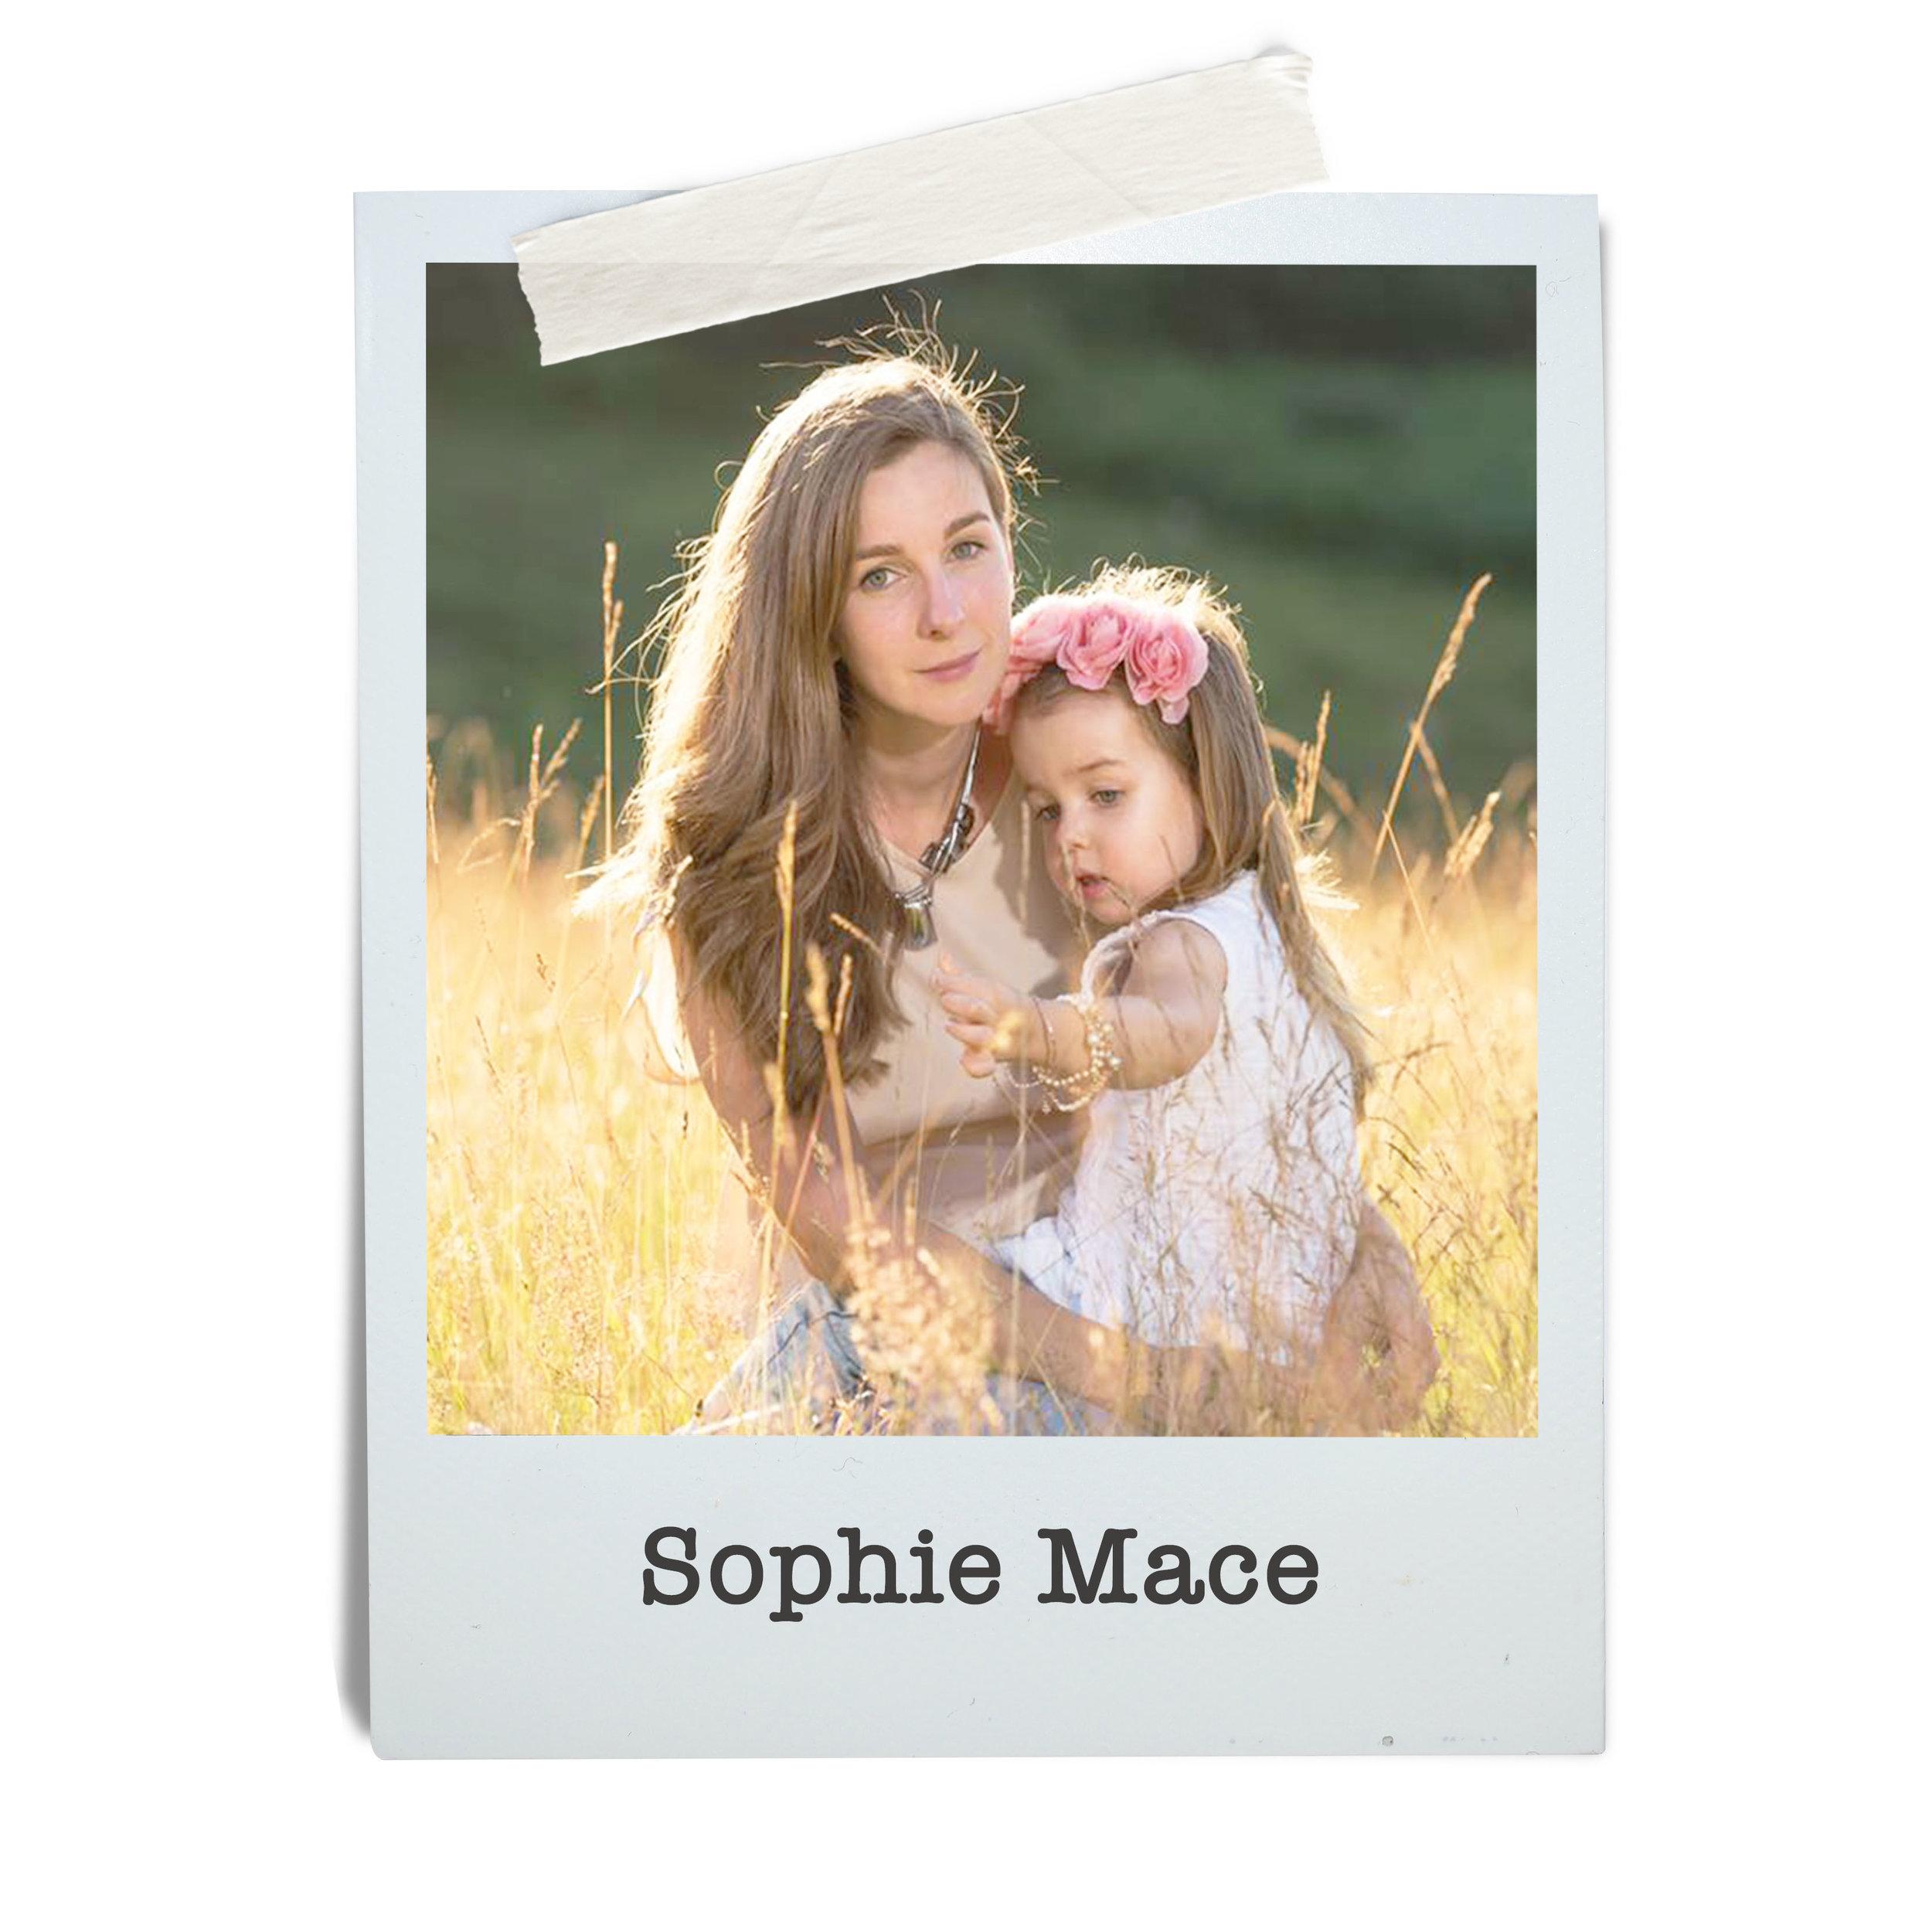 Sophie Mace